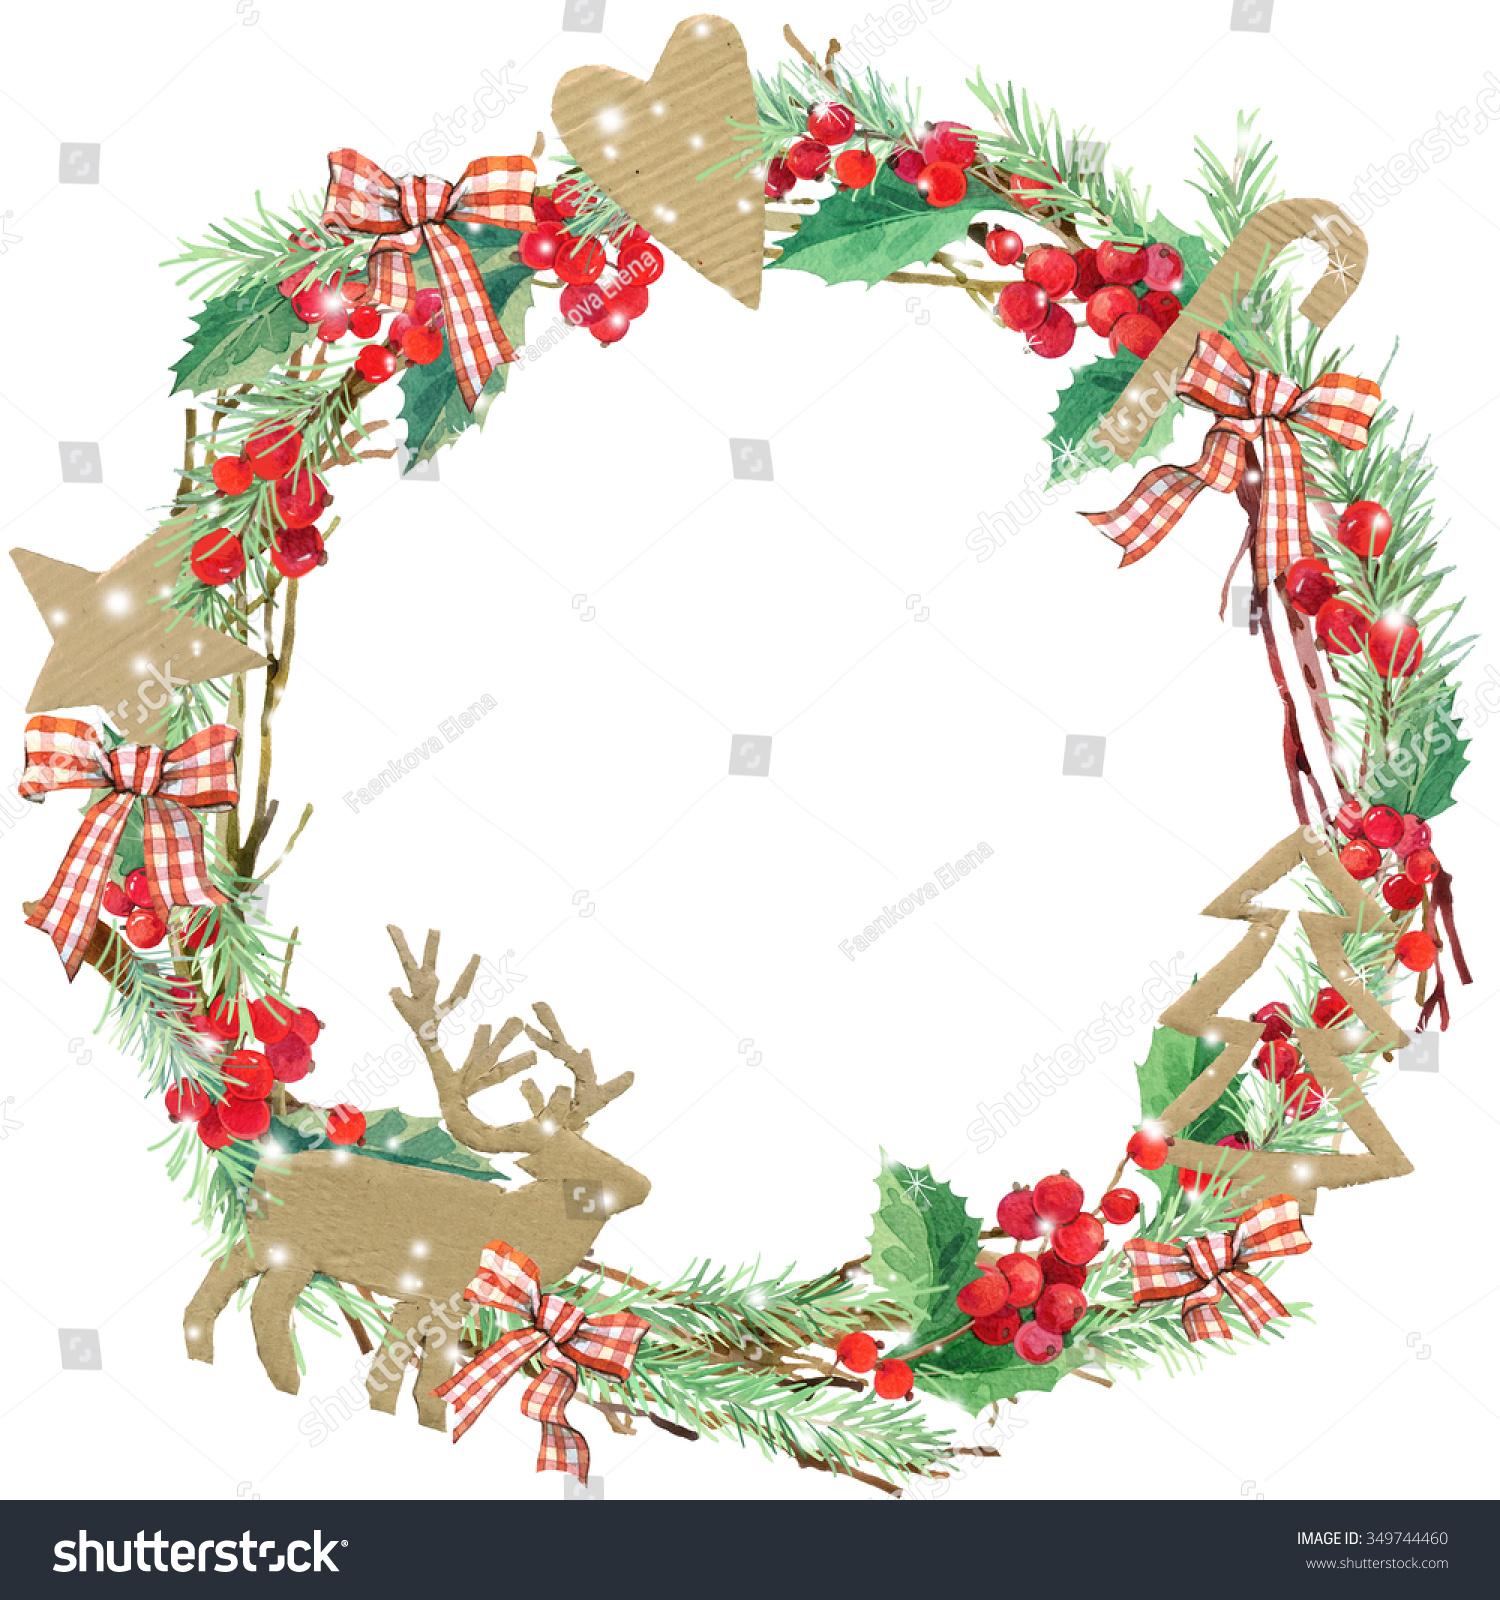 Watercolor Christmas Wreath Frame Watercolor Winter Stock ...